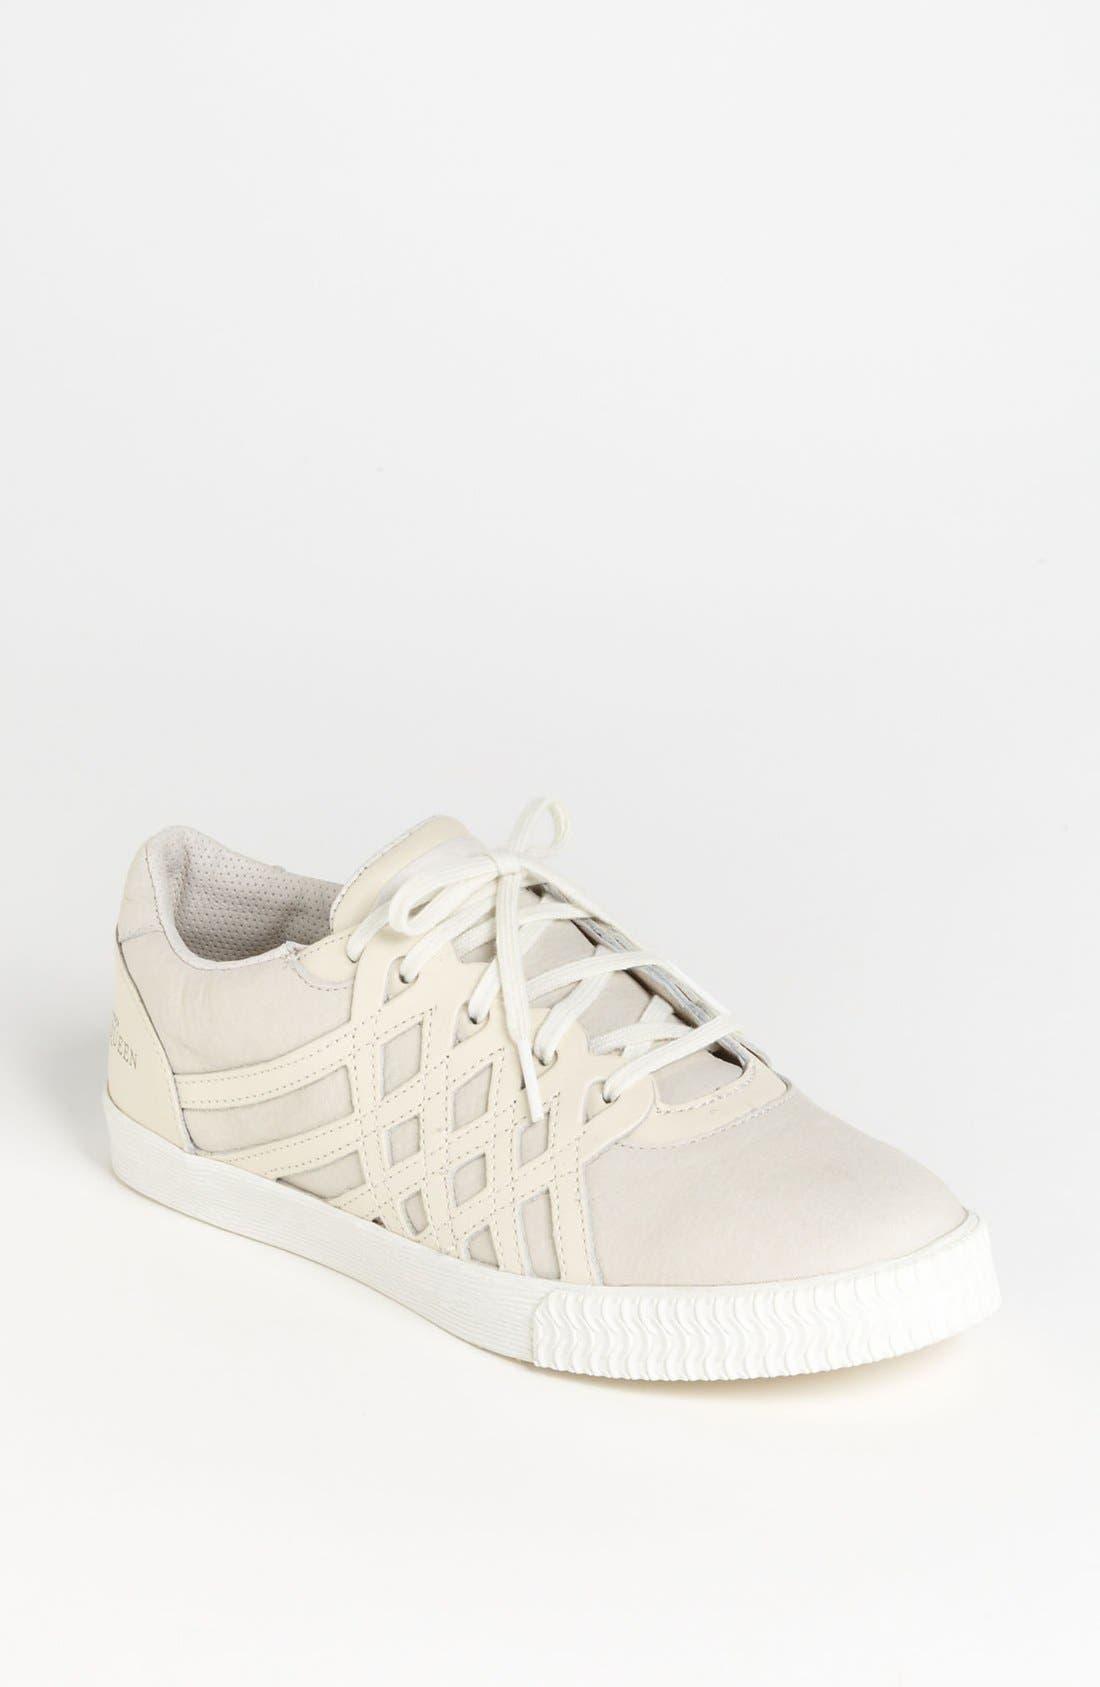 Alternate Image 1 Selected - Alexander McQueen PUMA 'Khomus' Sneaker (Women)